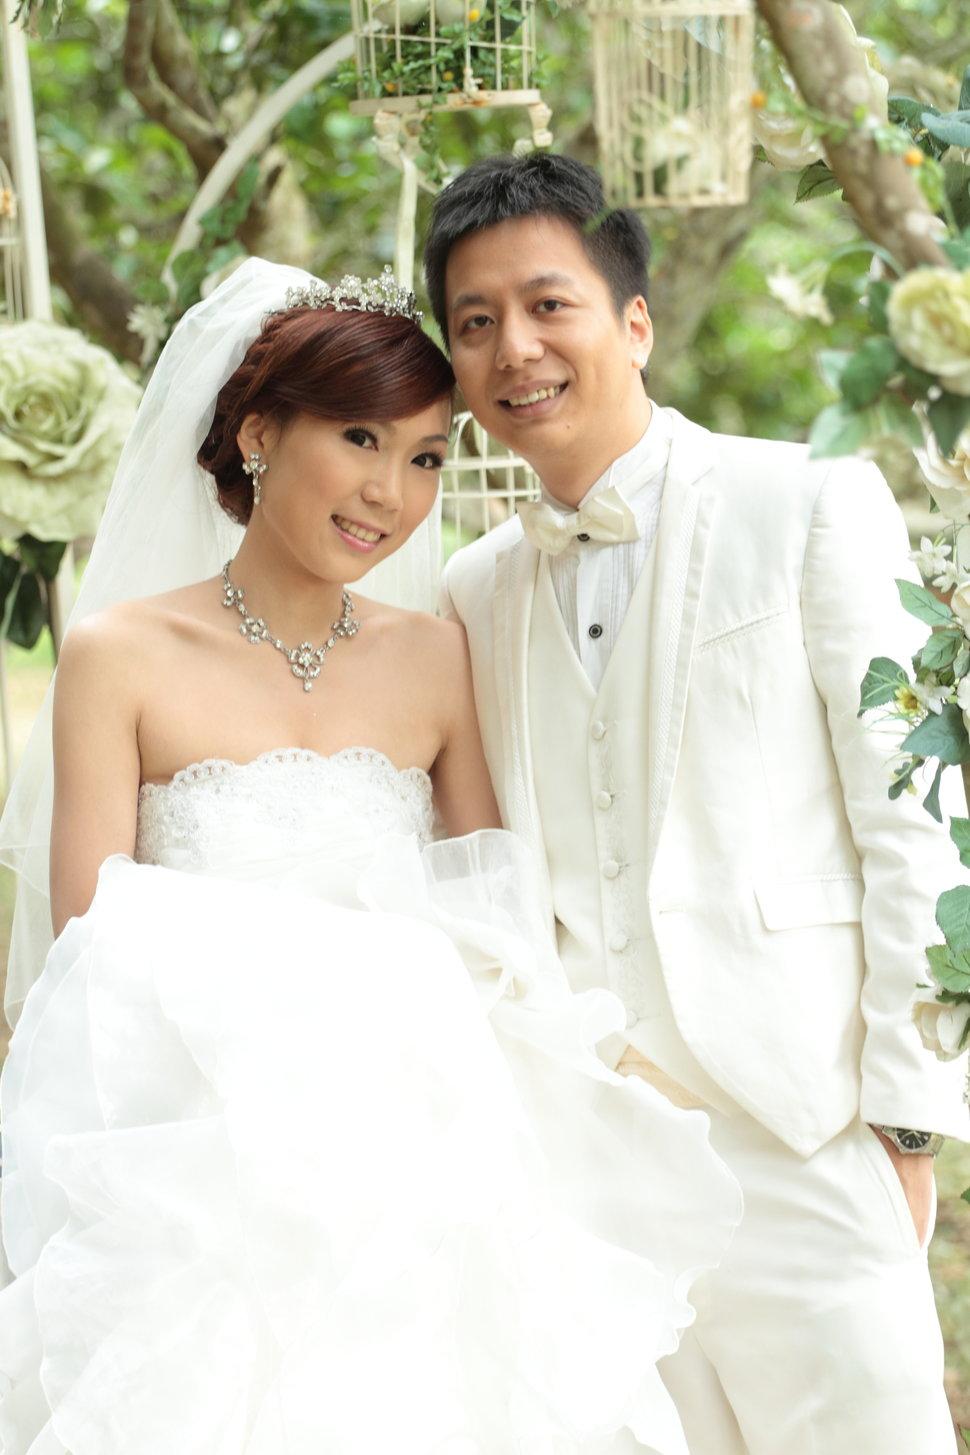 DPP_0002 - 全台最便宜-45DESIGN四五婚紗禮服《結婚吧》